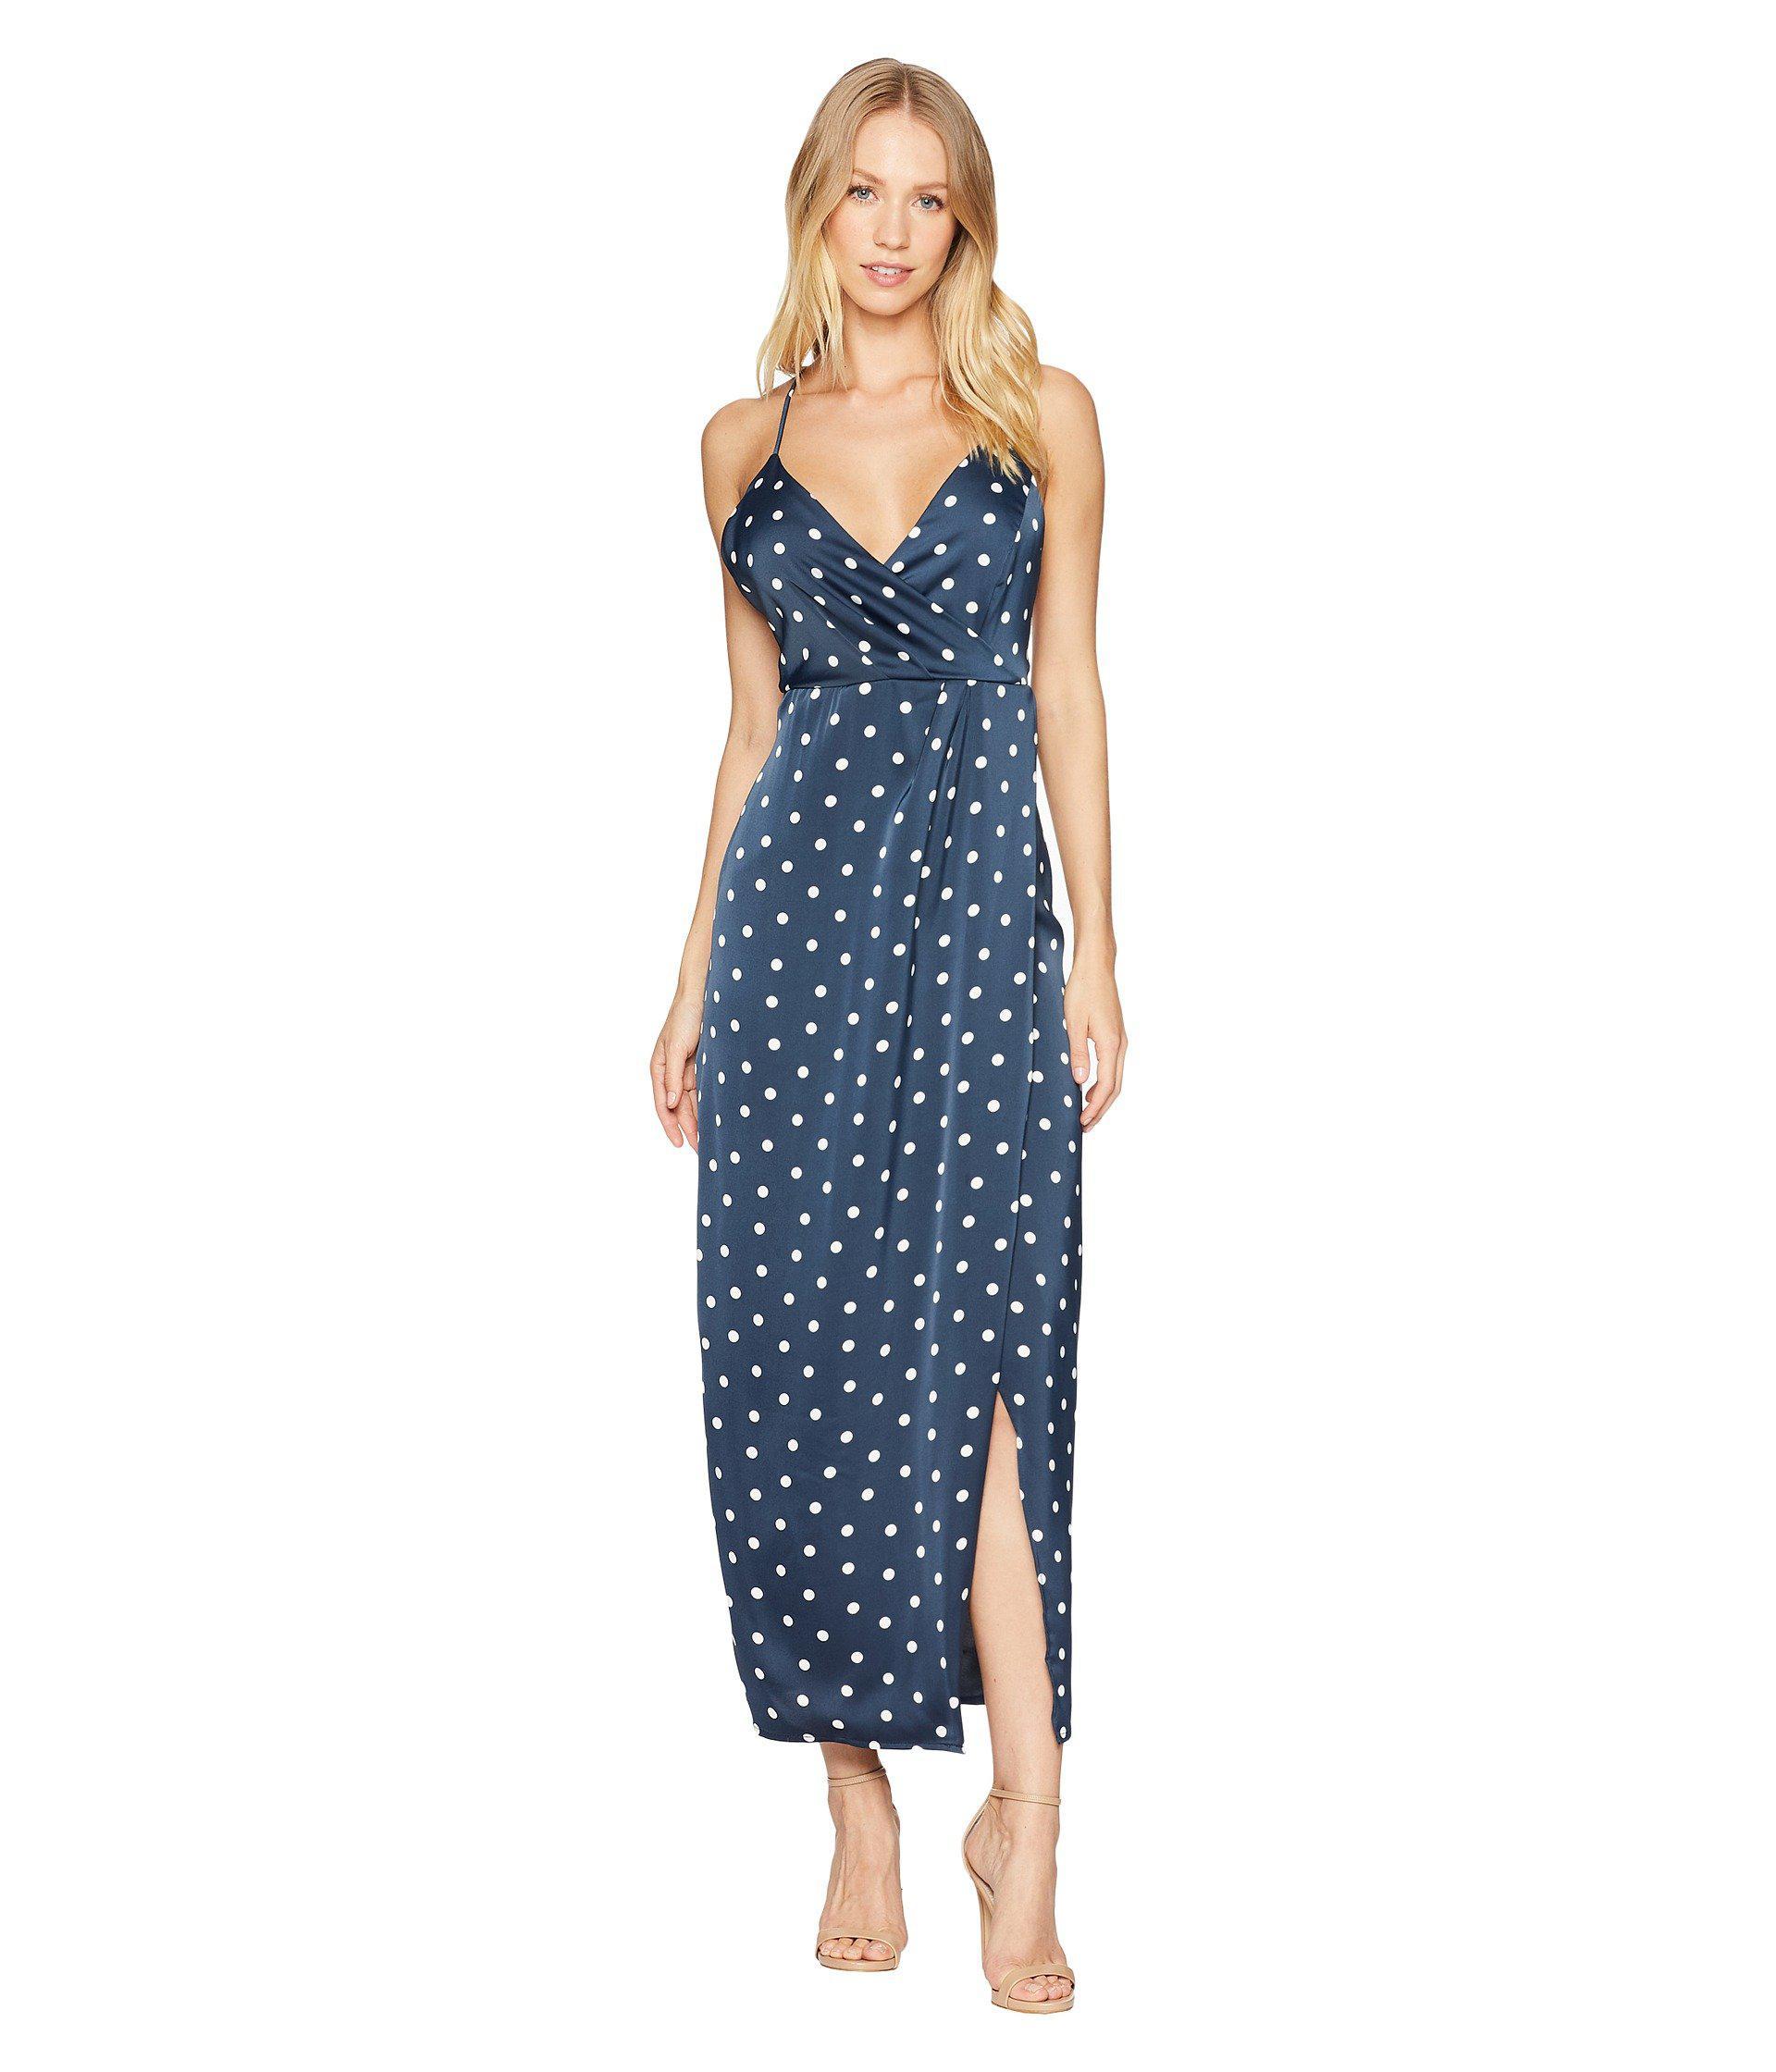 c5e980701f98 Lyst - Bardot Spotty Wrap Dress (french Navy) Women s Dress in Blue